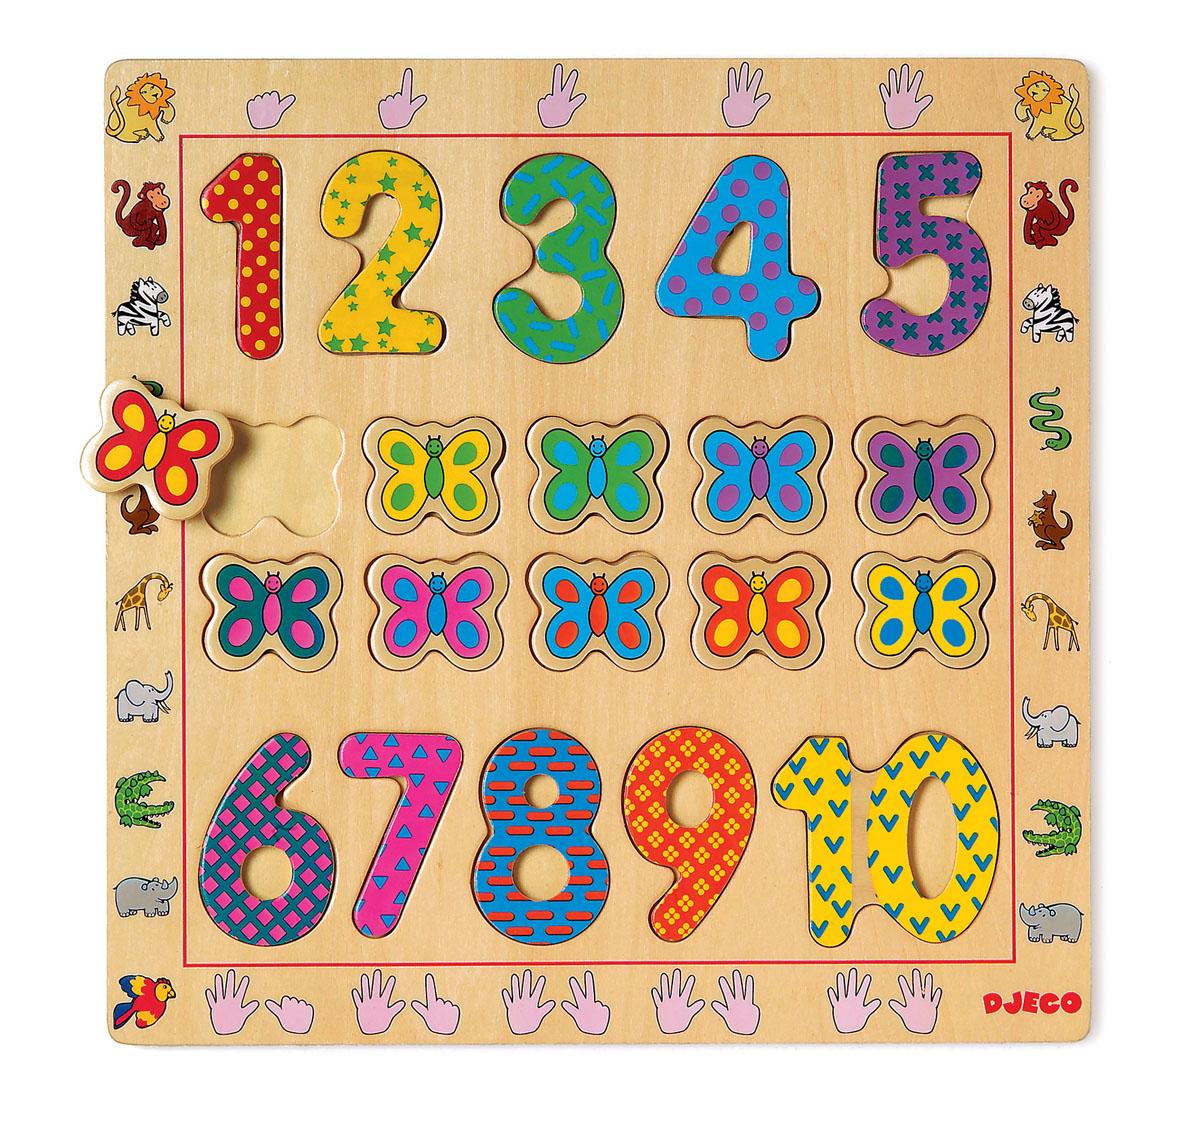 Djeco Пазл для малышей От до01801Деревянная рамка-вкладыши с цифрами от 1 до 10..